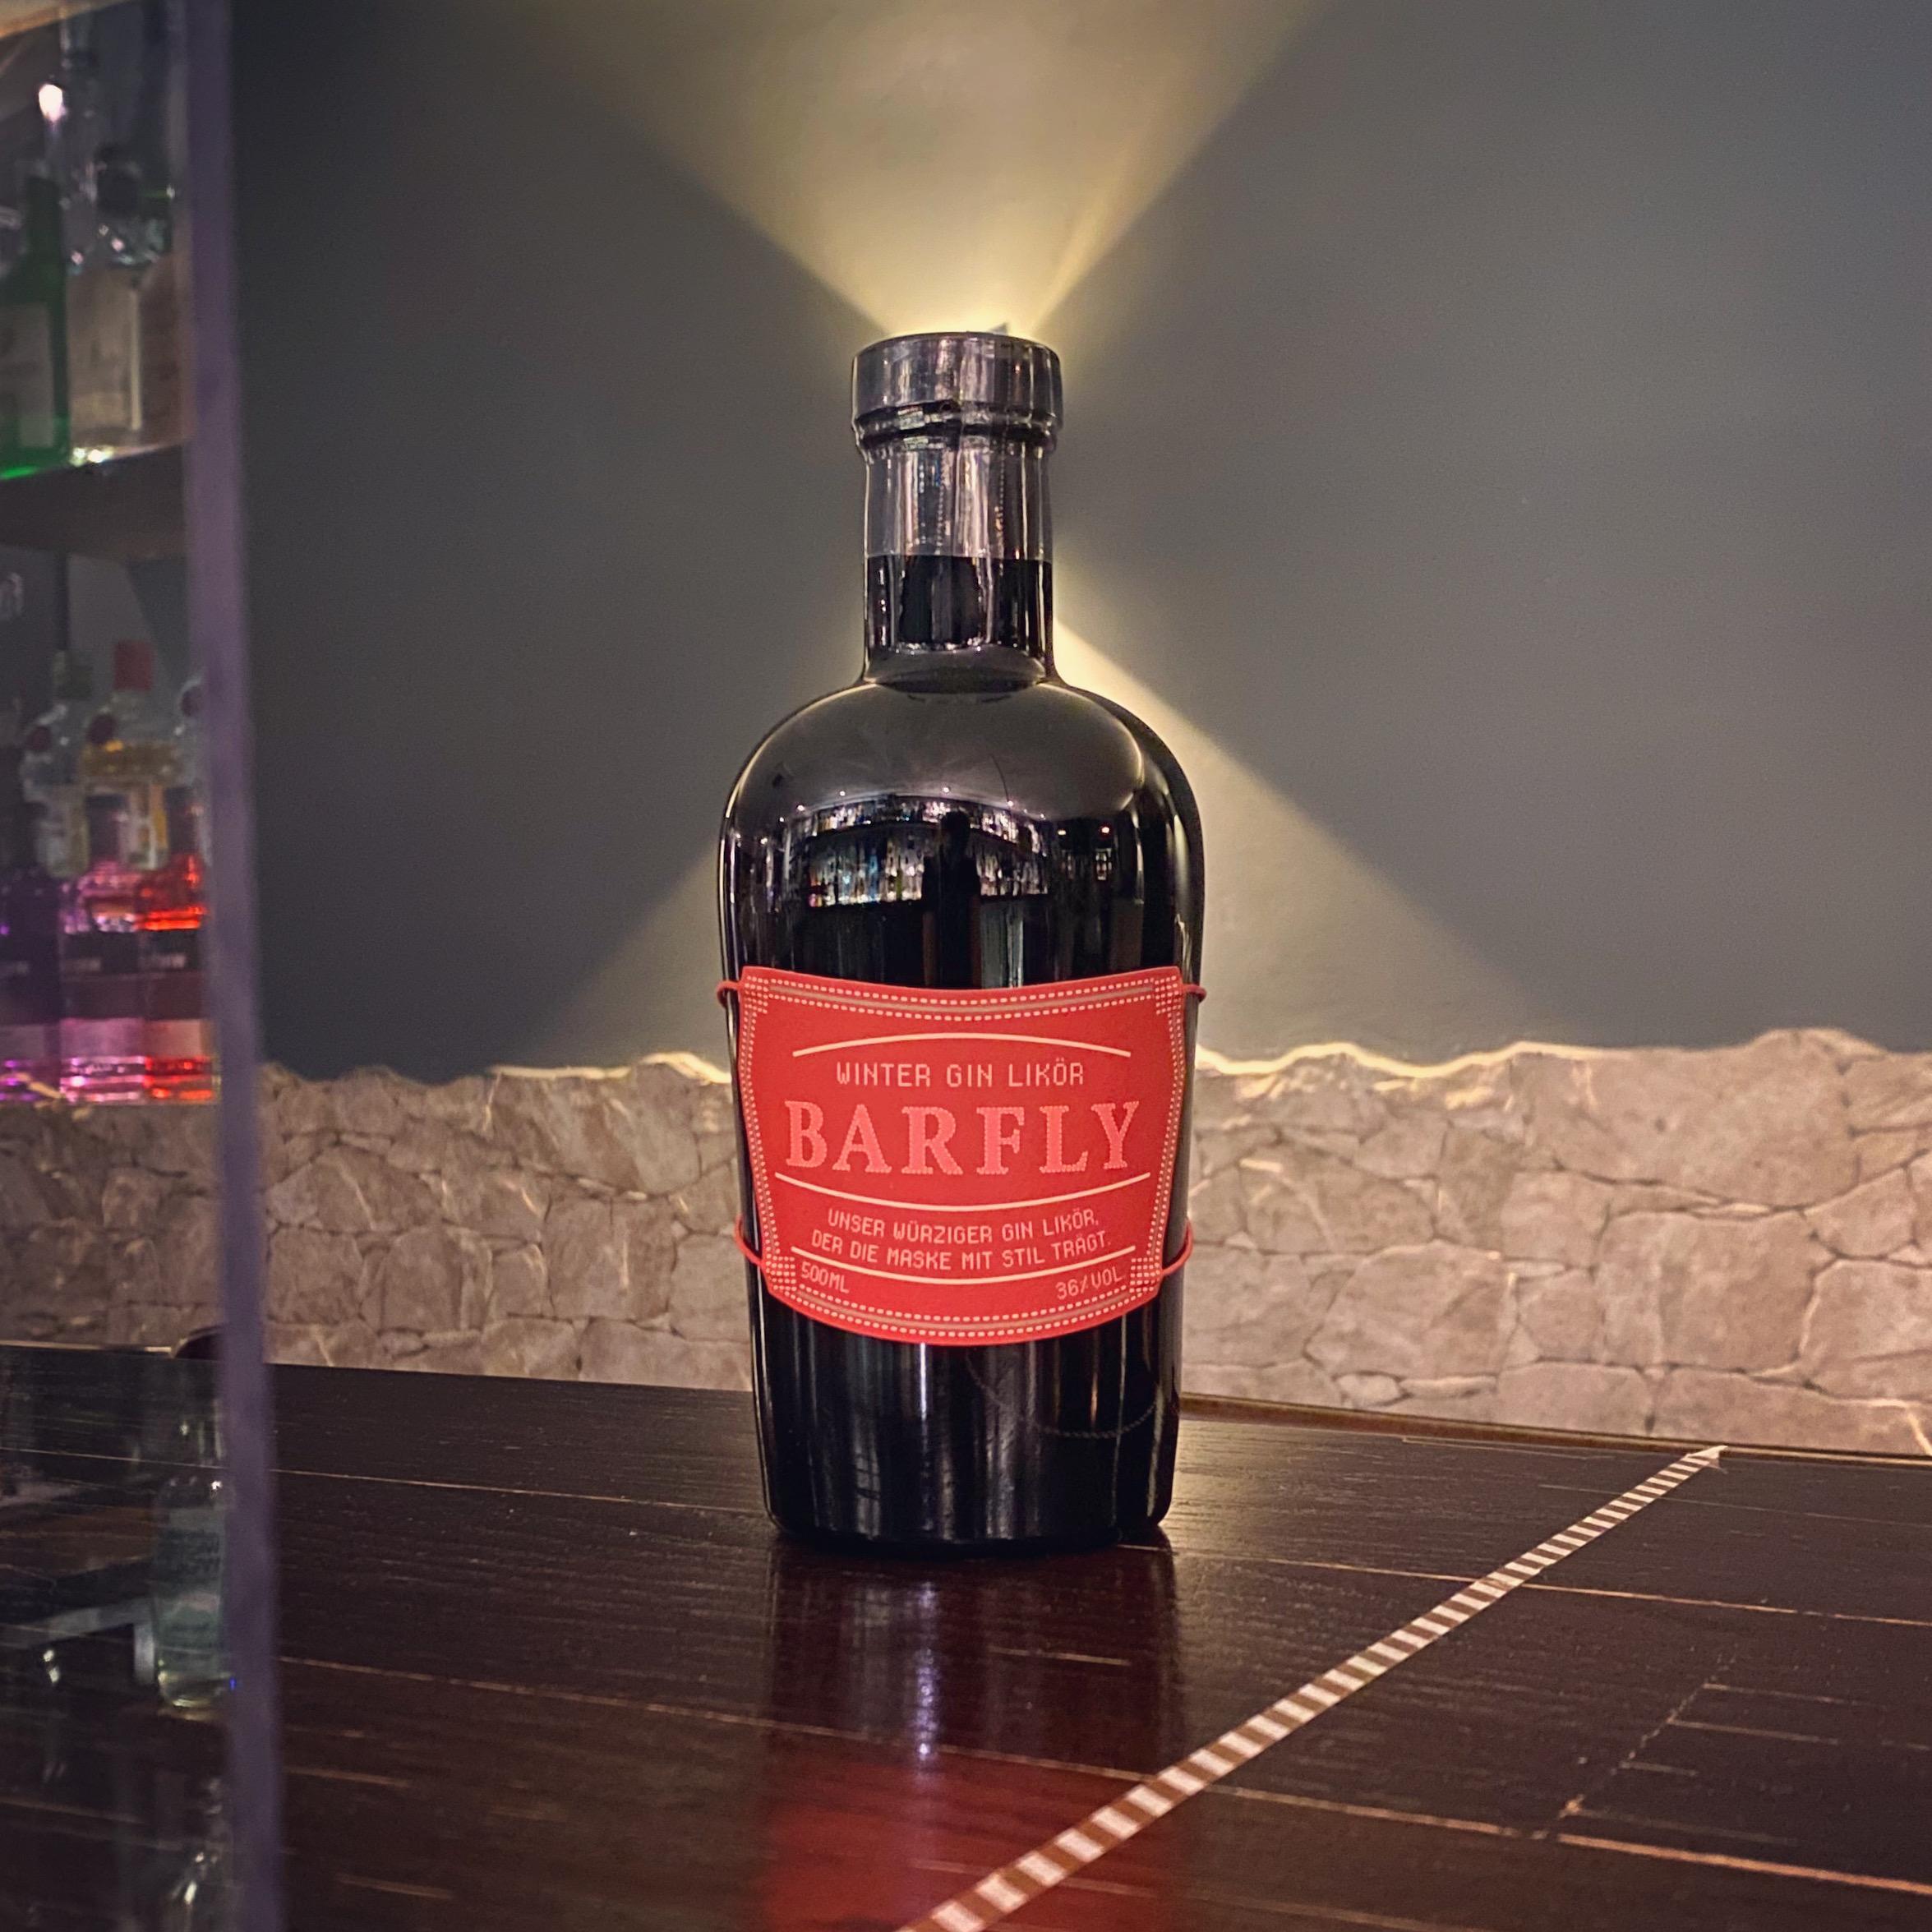 Barfly Winter Gin Liquor